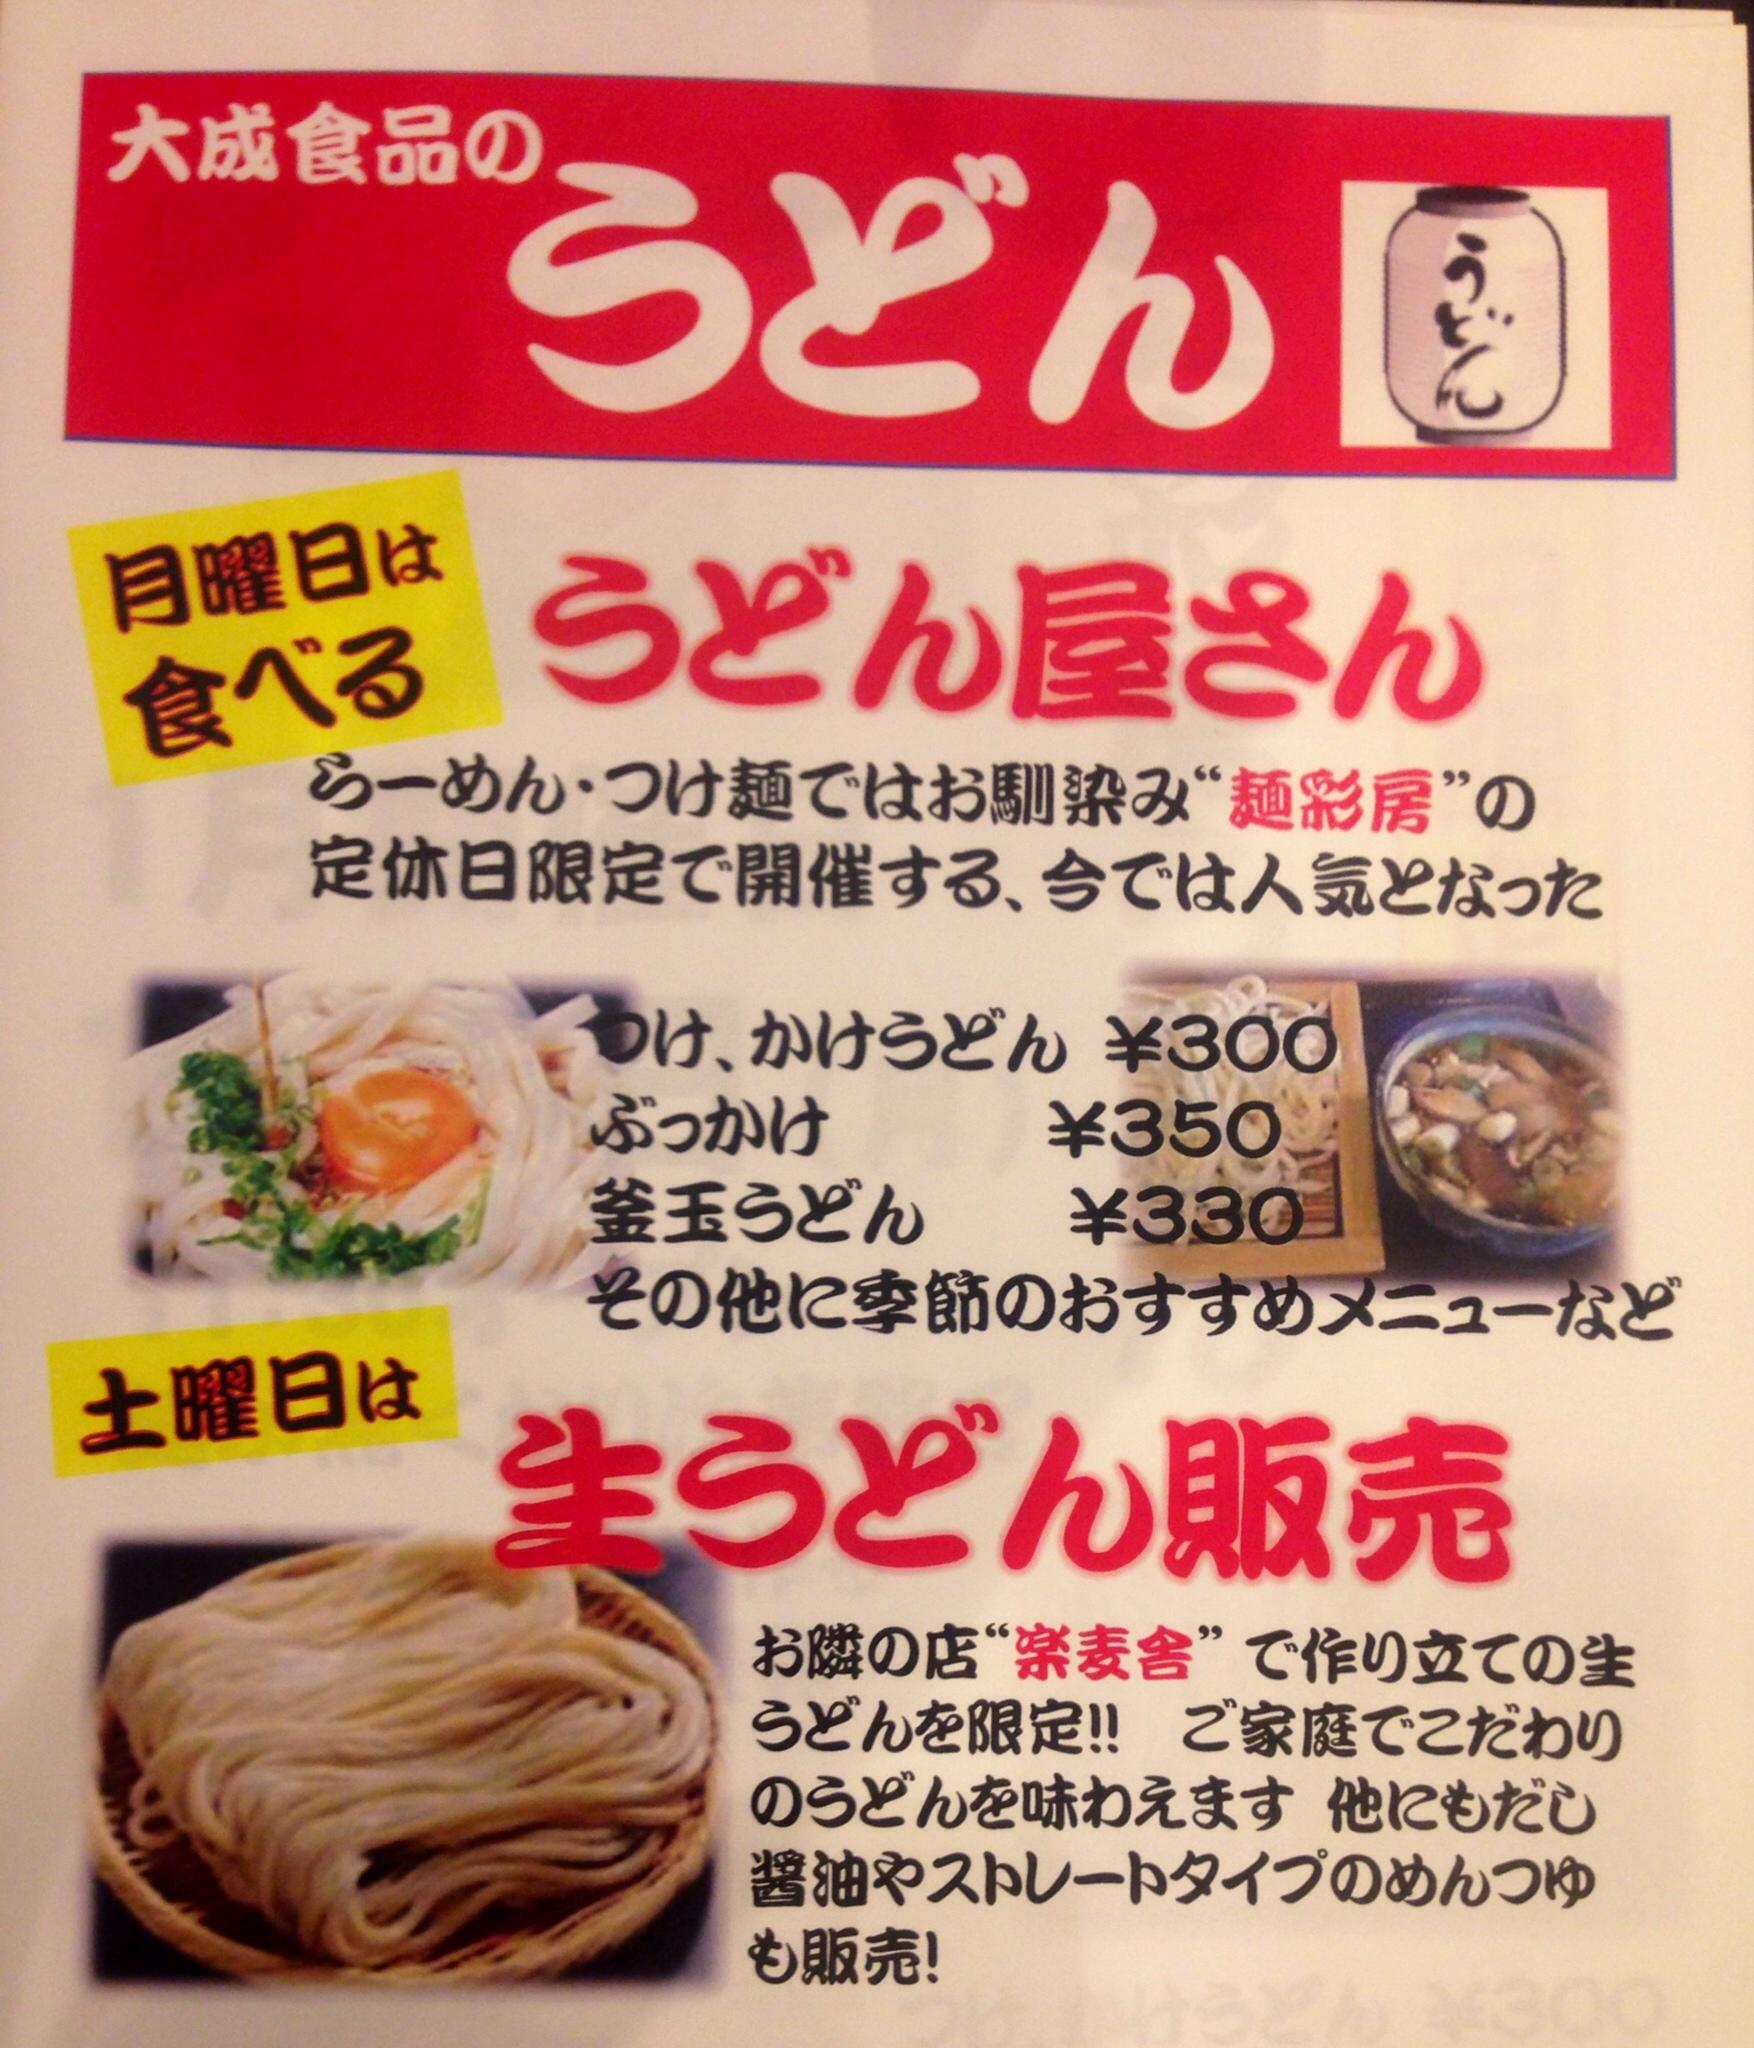 fc2blog_20141224094026997.jpg